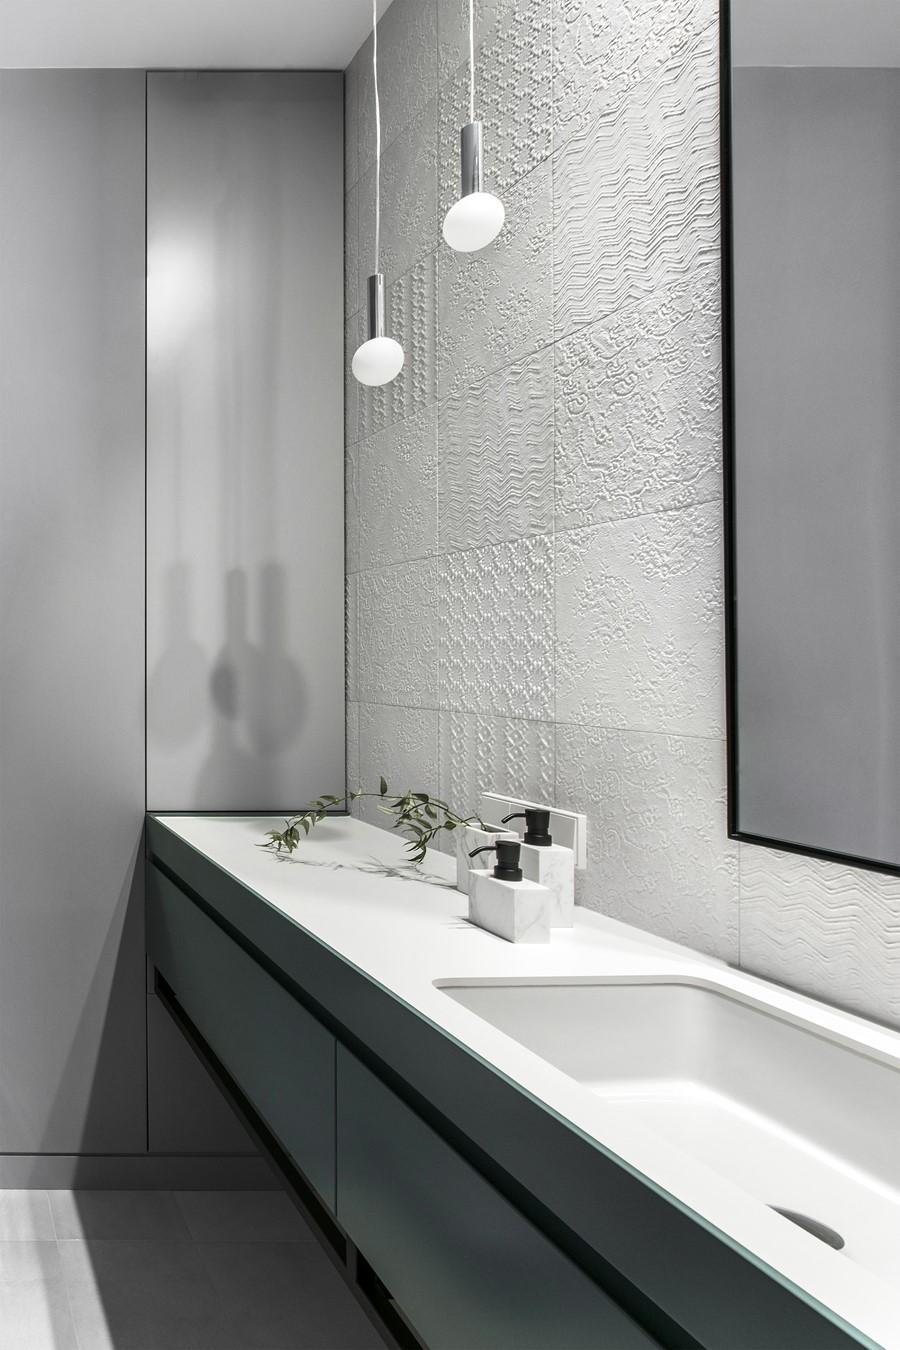 interior-design-by-normundas-vilkas-11